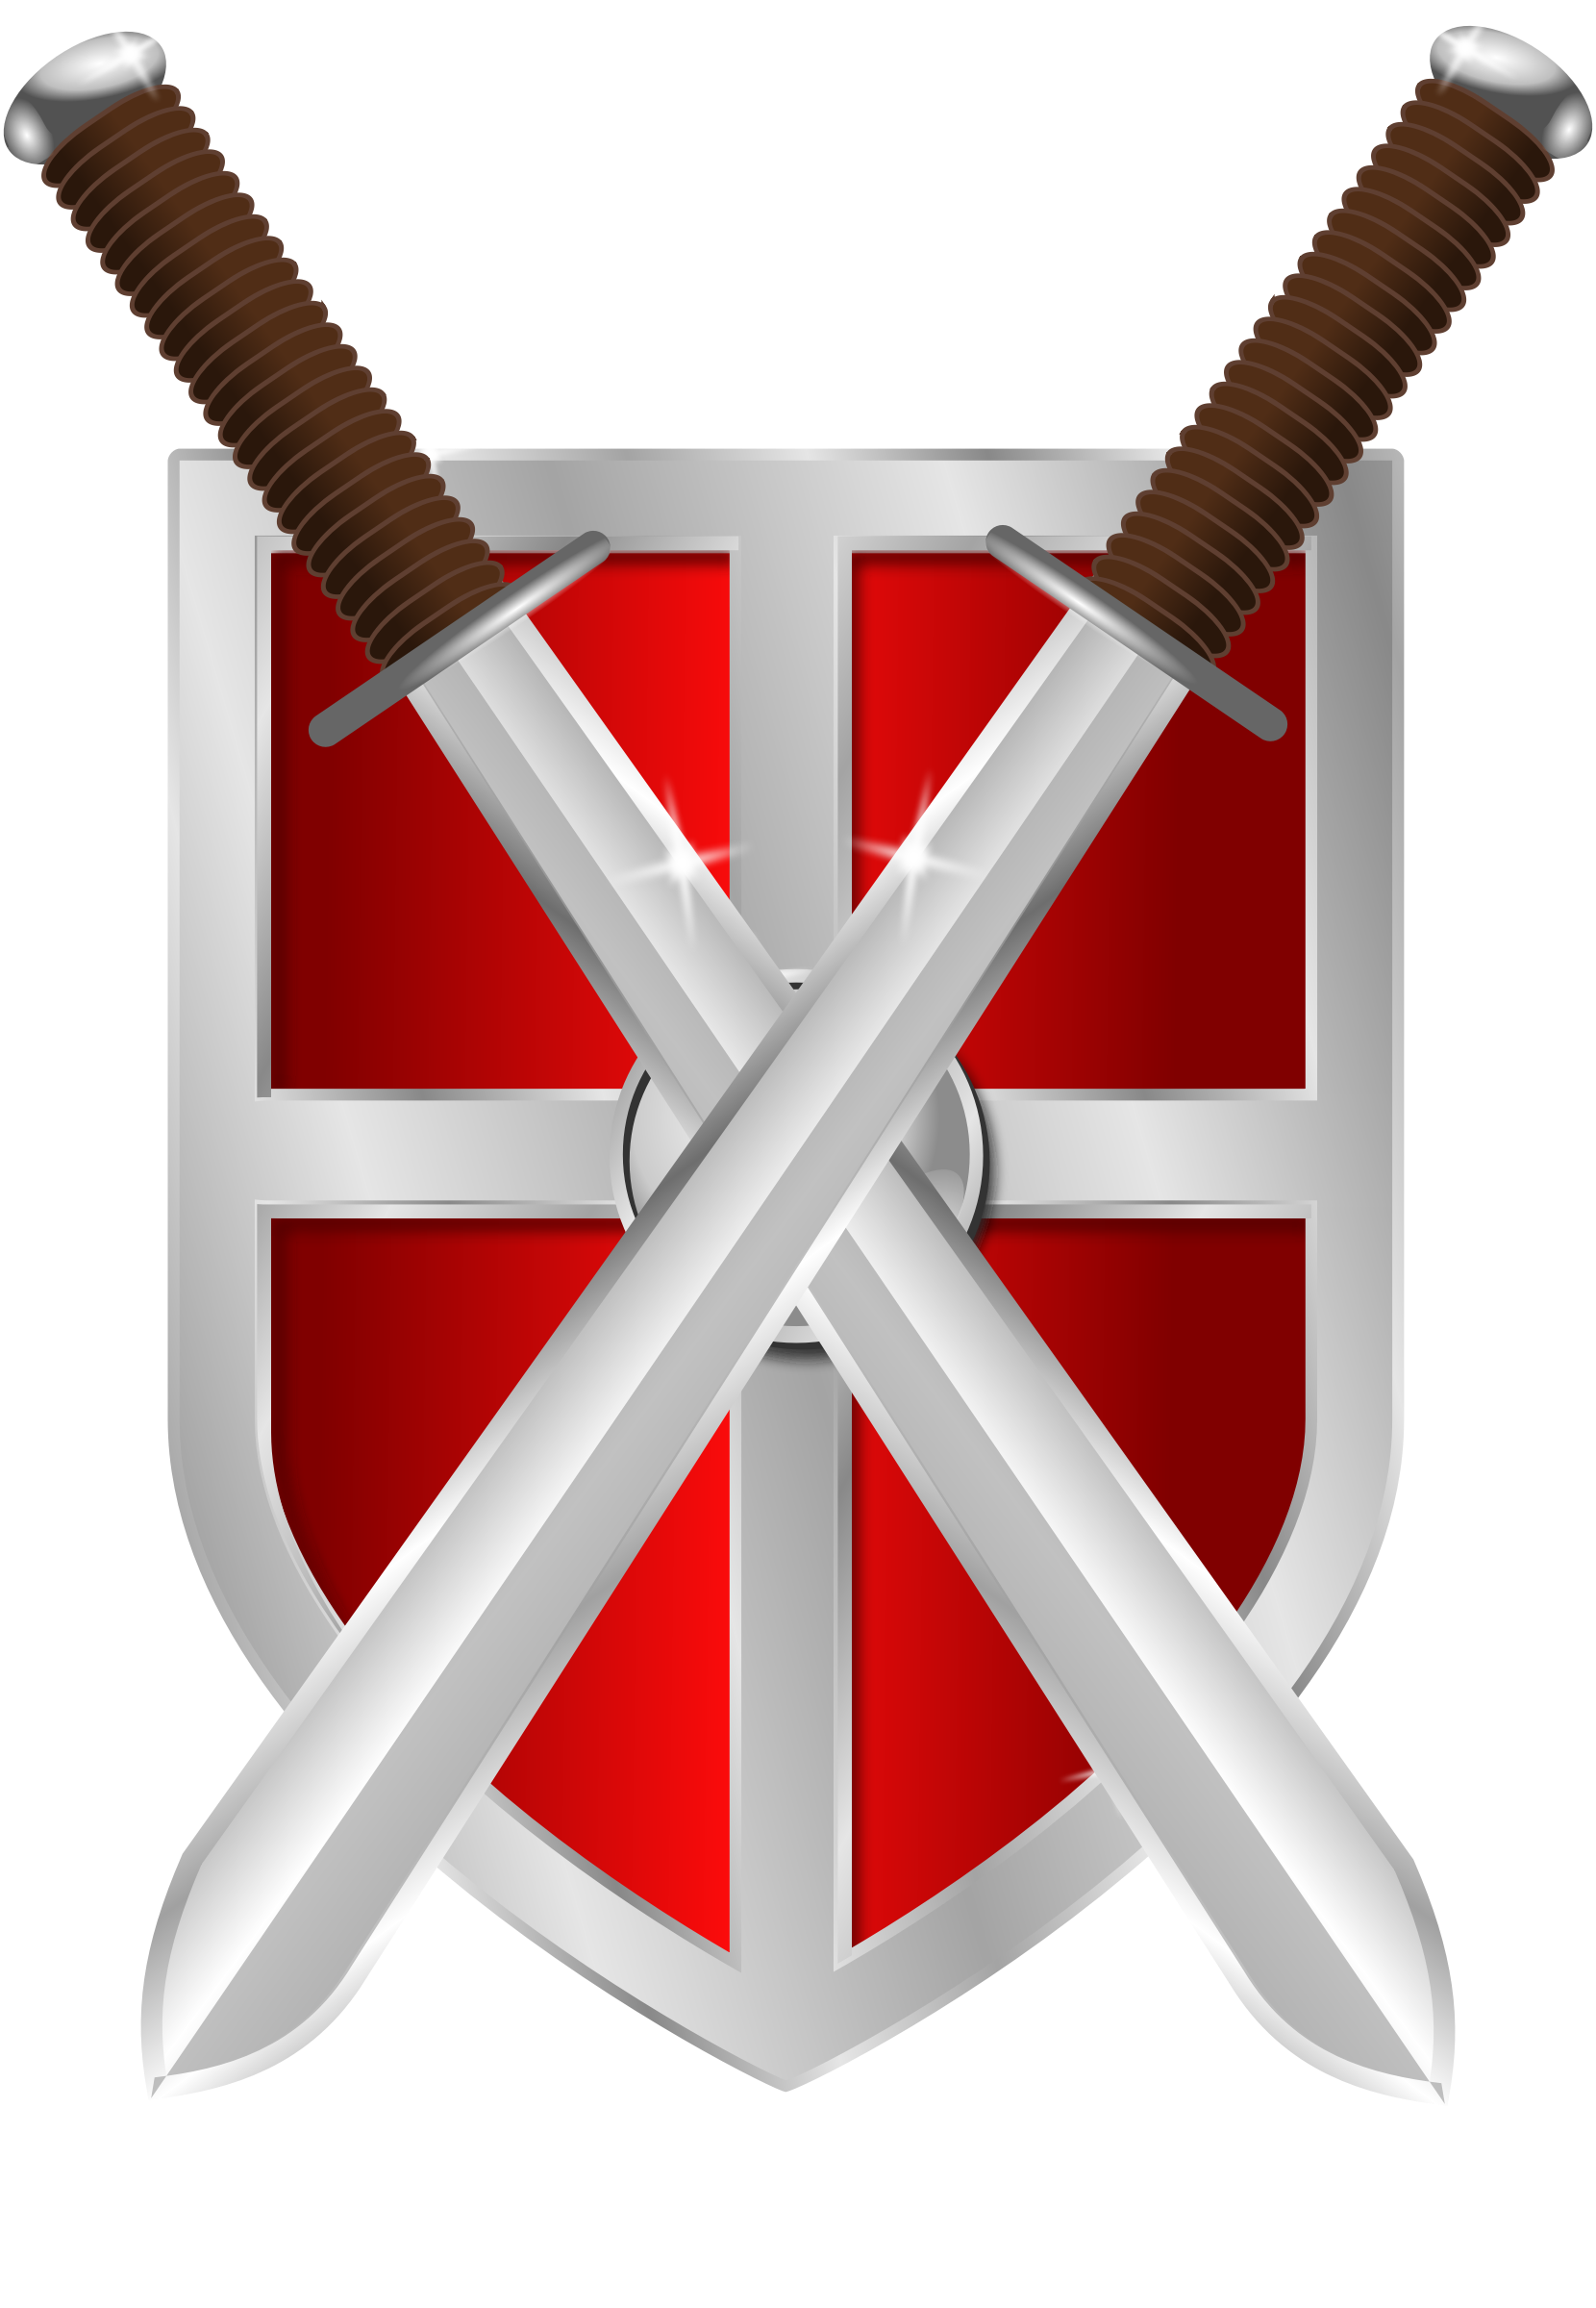 Swords and a big. Clipart shield armor shield